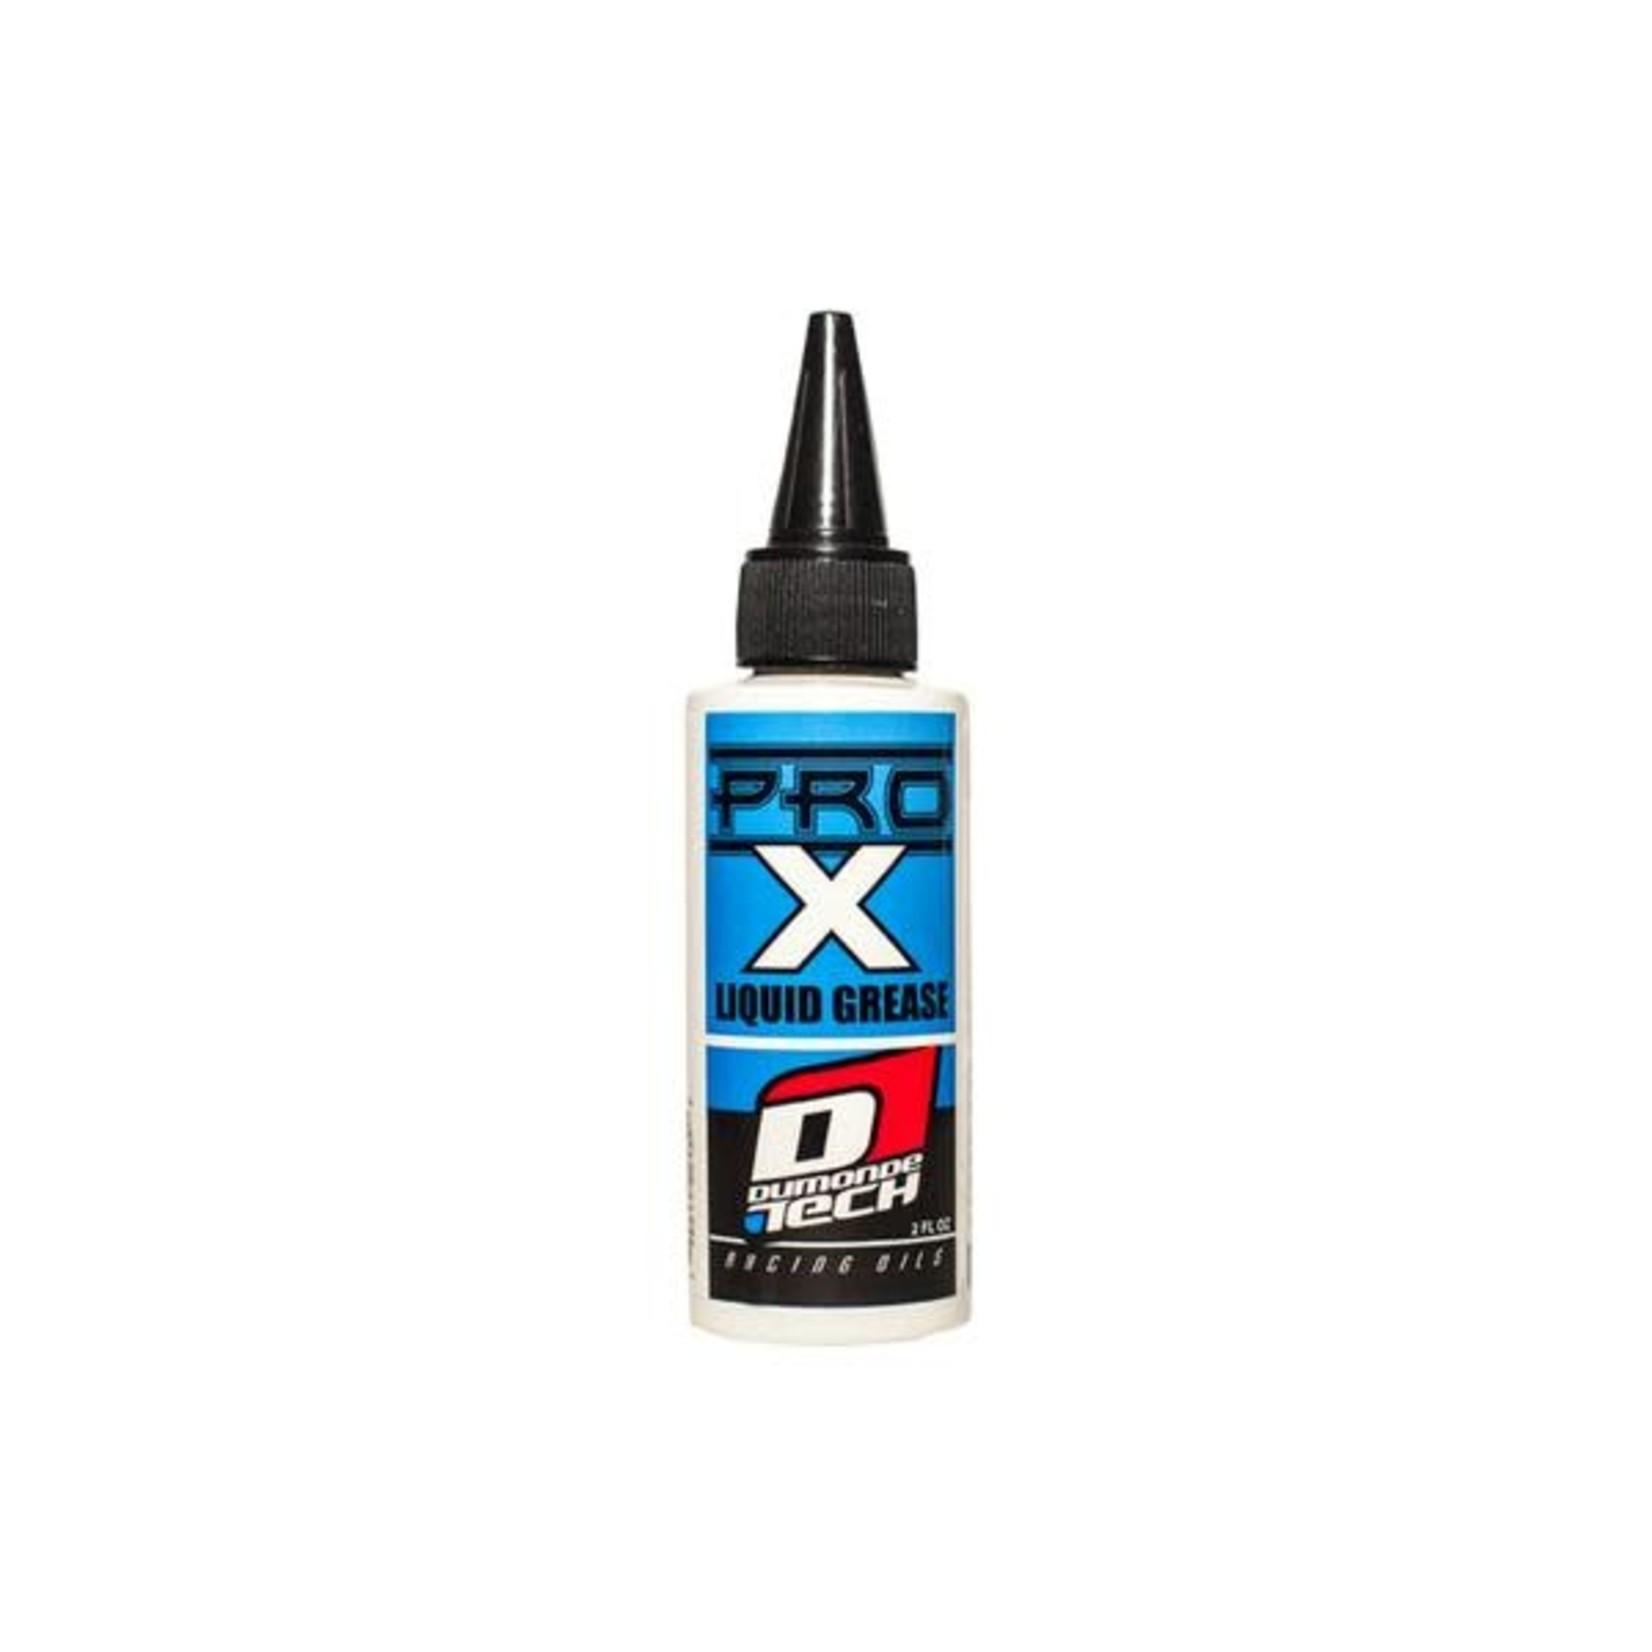 Dumonde Dumonde Tech Pro X Liquid Grease 2oz Bottle (60mL)